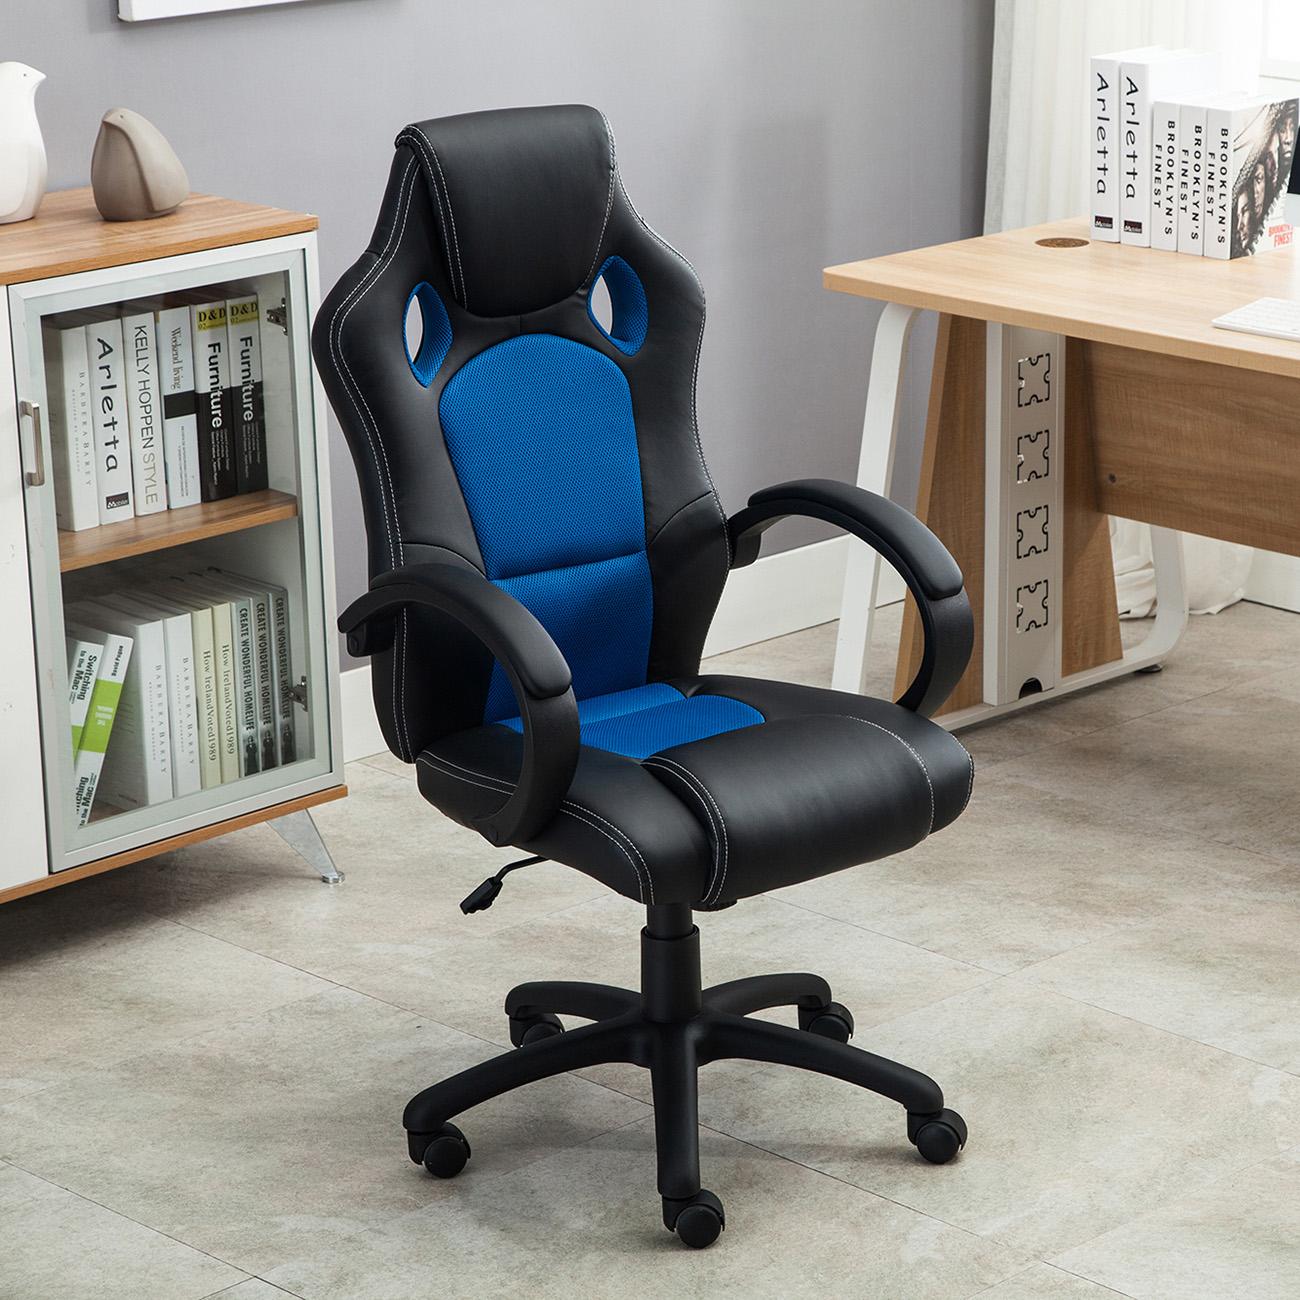 High Back Race Car Style Bucket Seat Office Desk Chair